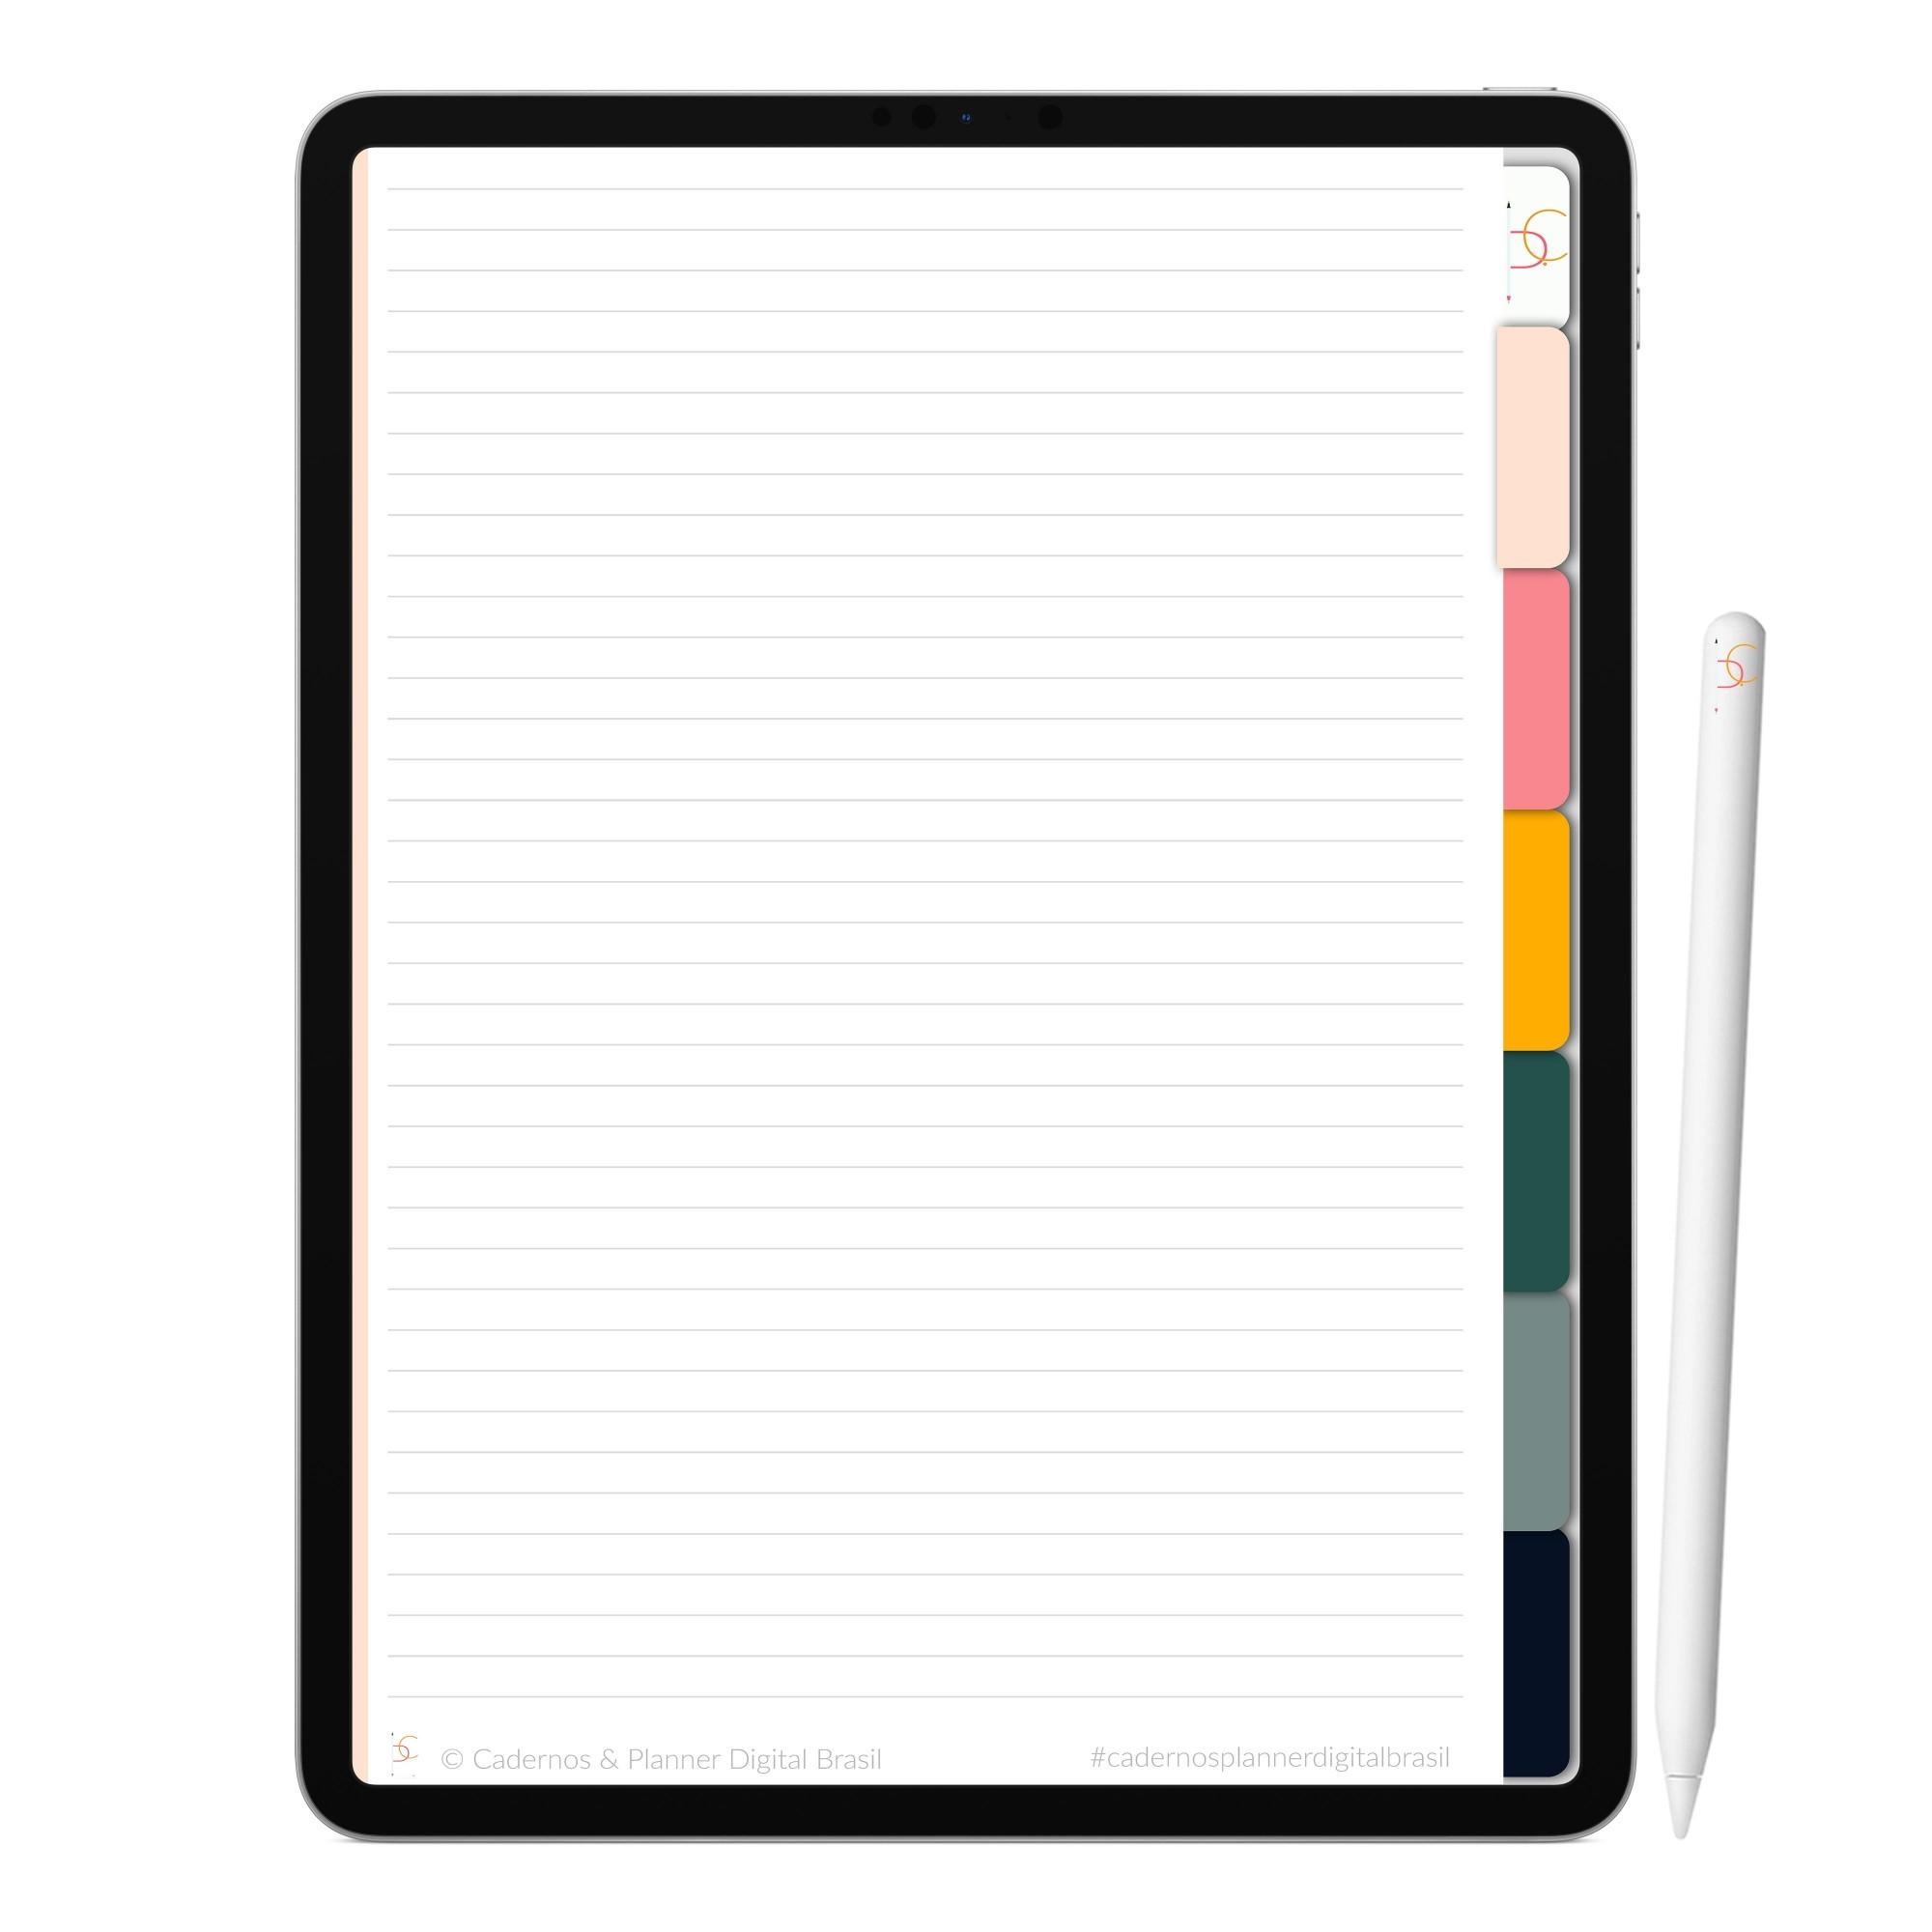 Caderno Digital Love Pink | Seis Divisórias Interativo| iPad Tablet | Download Instantâneo